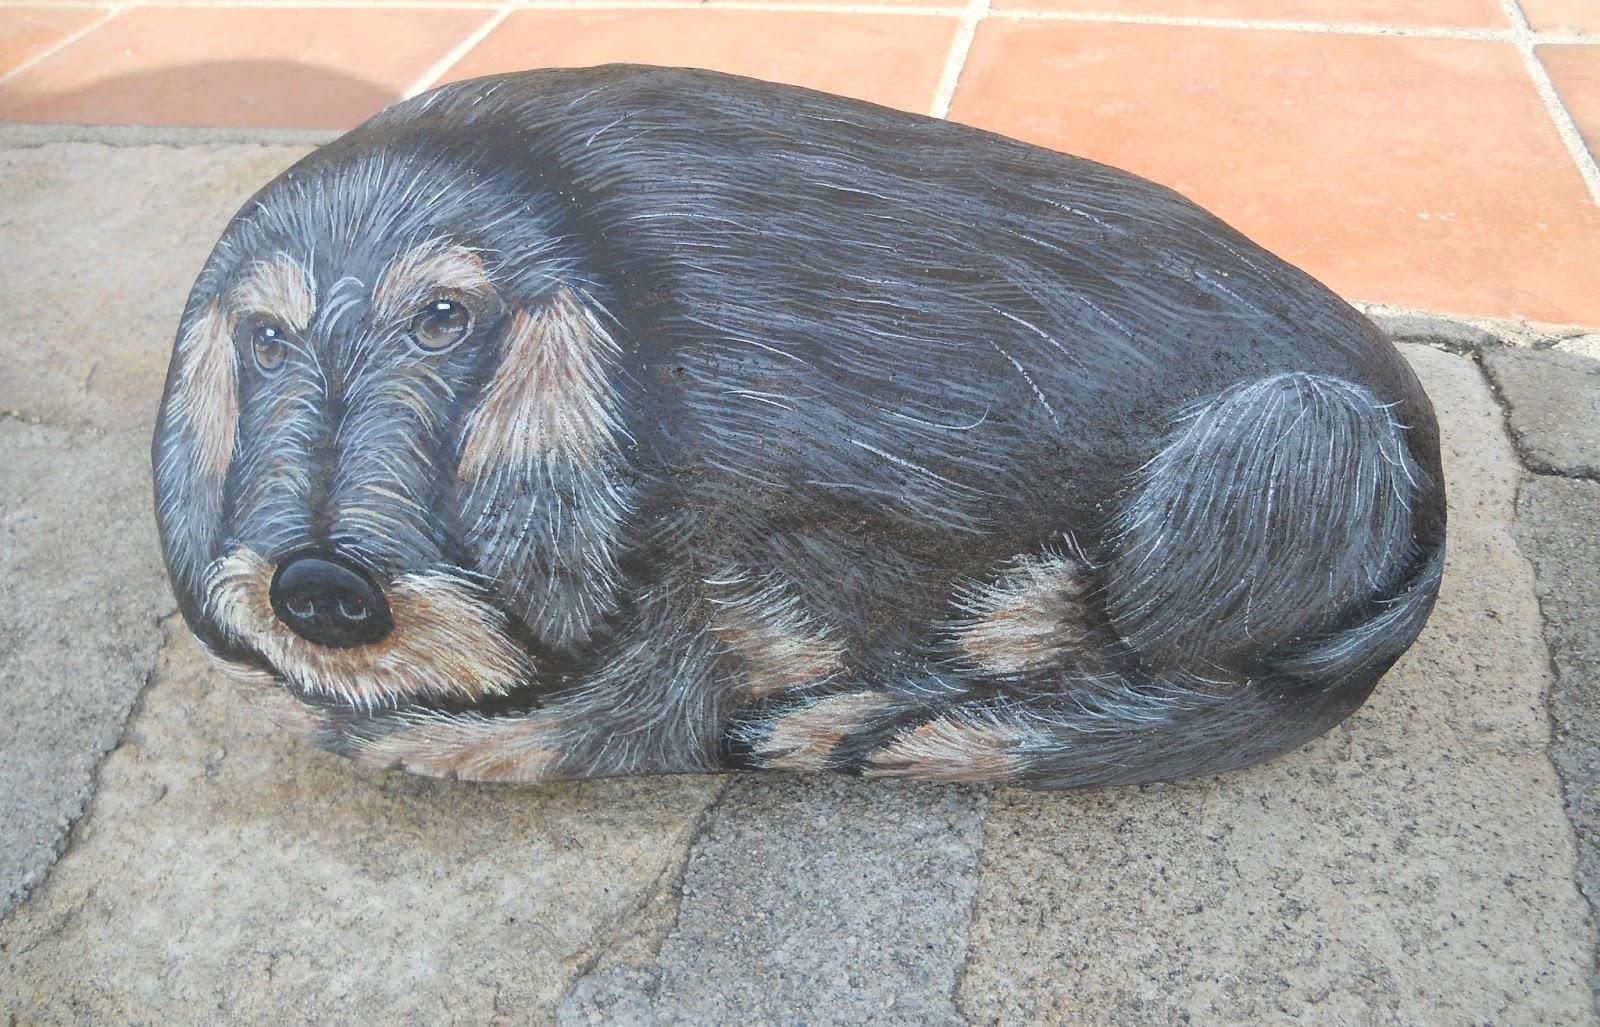 Piedras pintadas a mano como pintar piedras de perros for Tecnica para pintar piedras